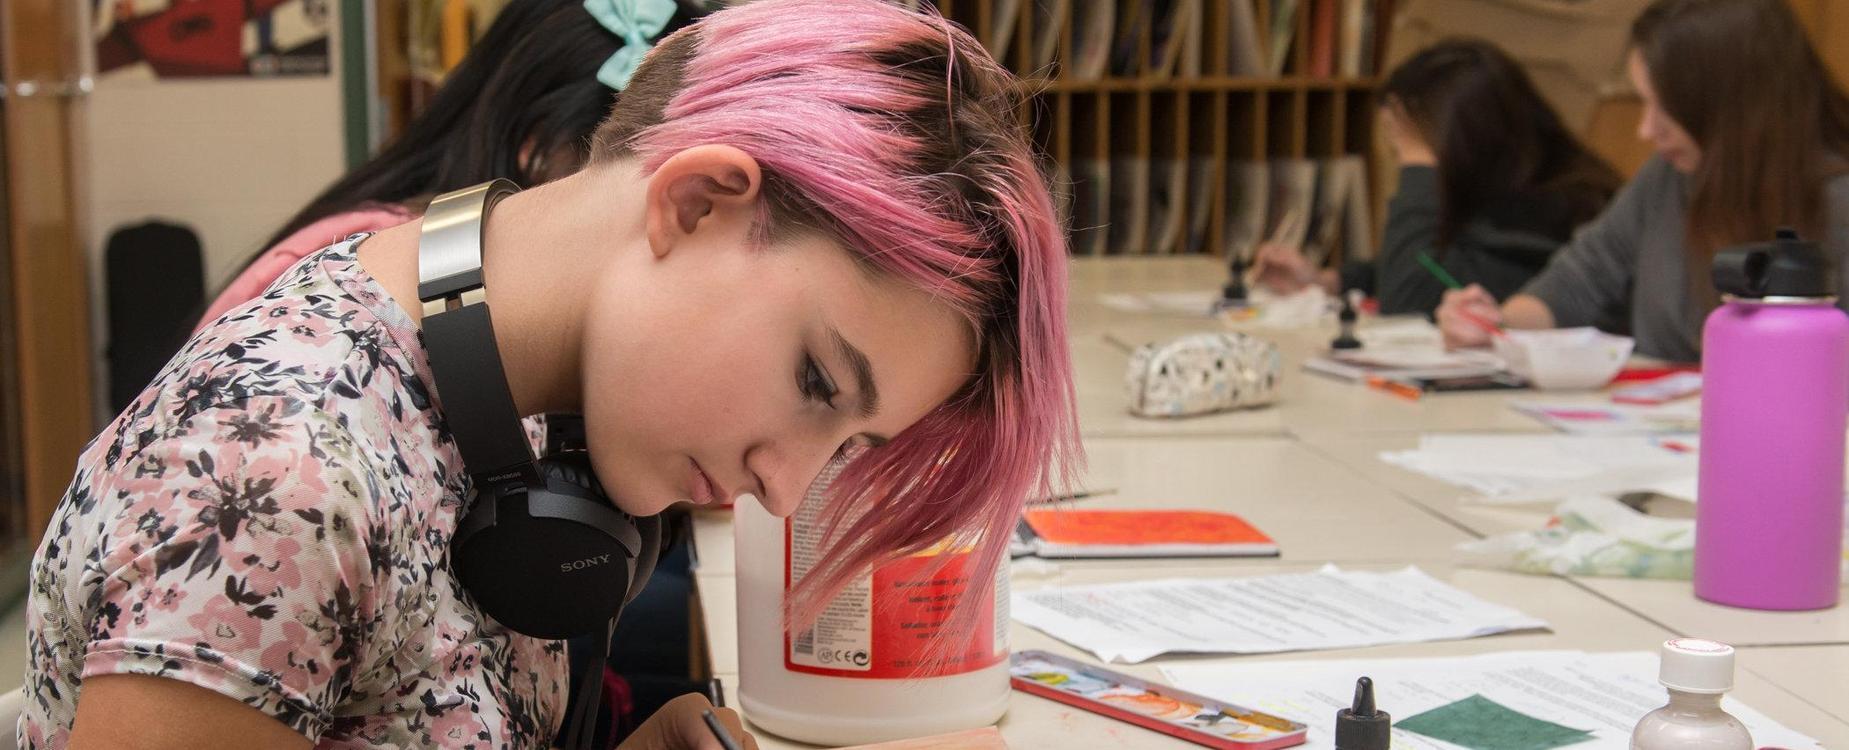 Mainland art student